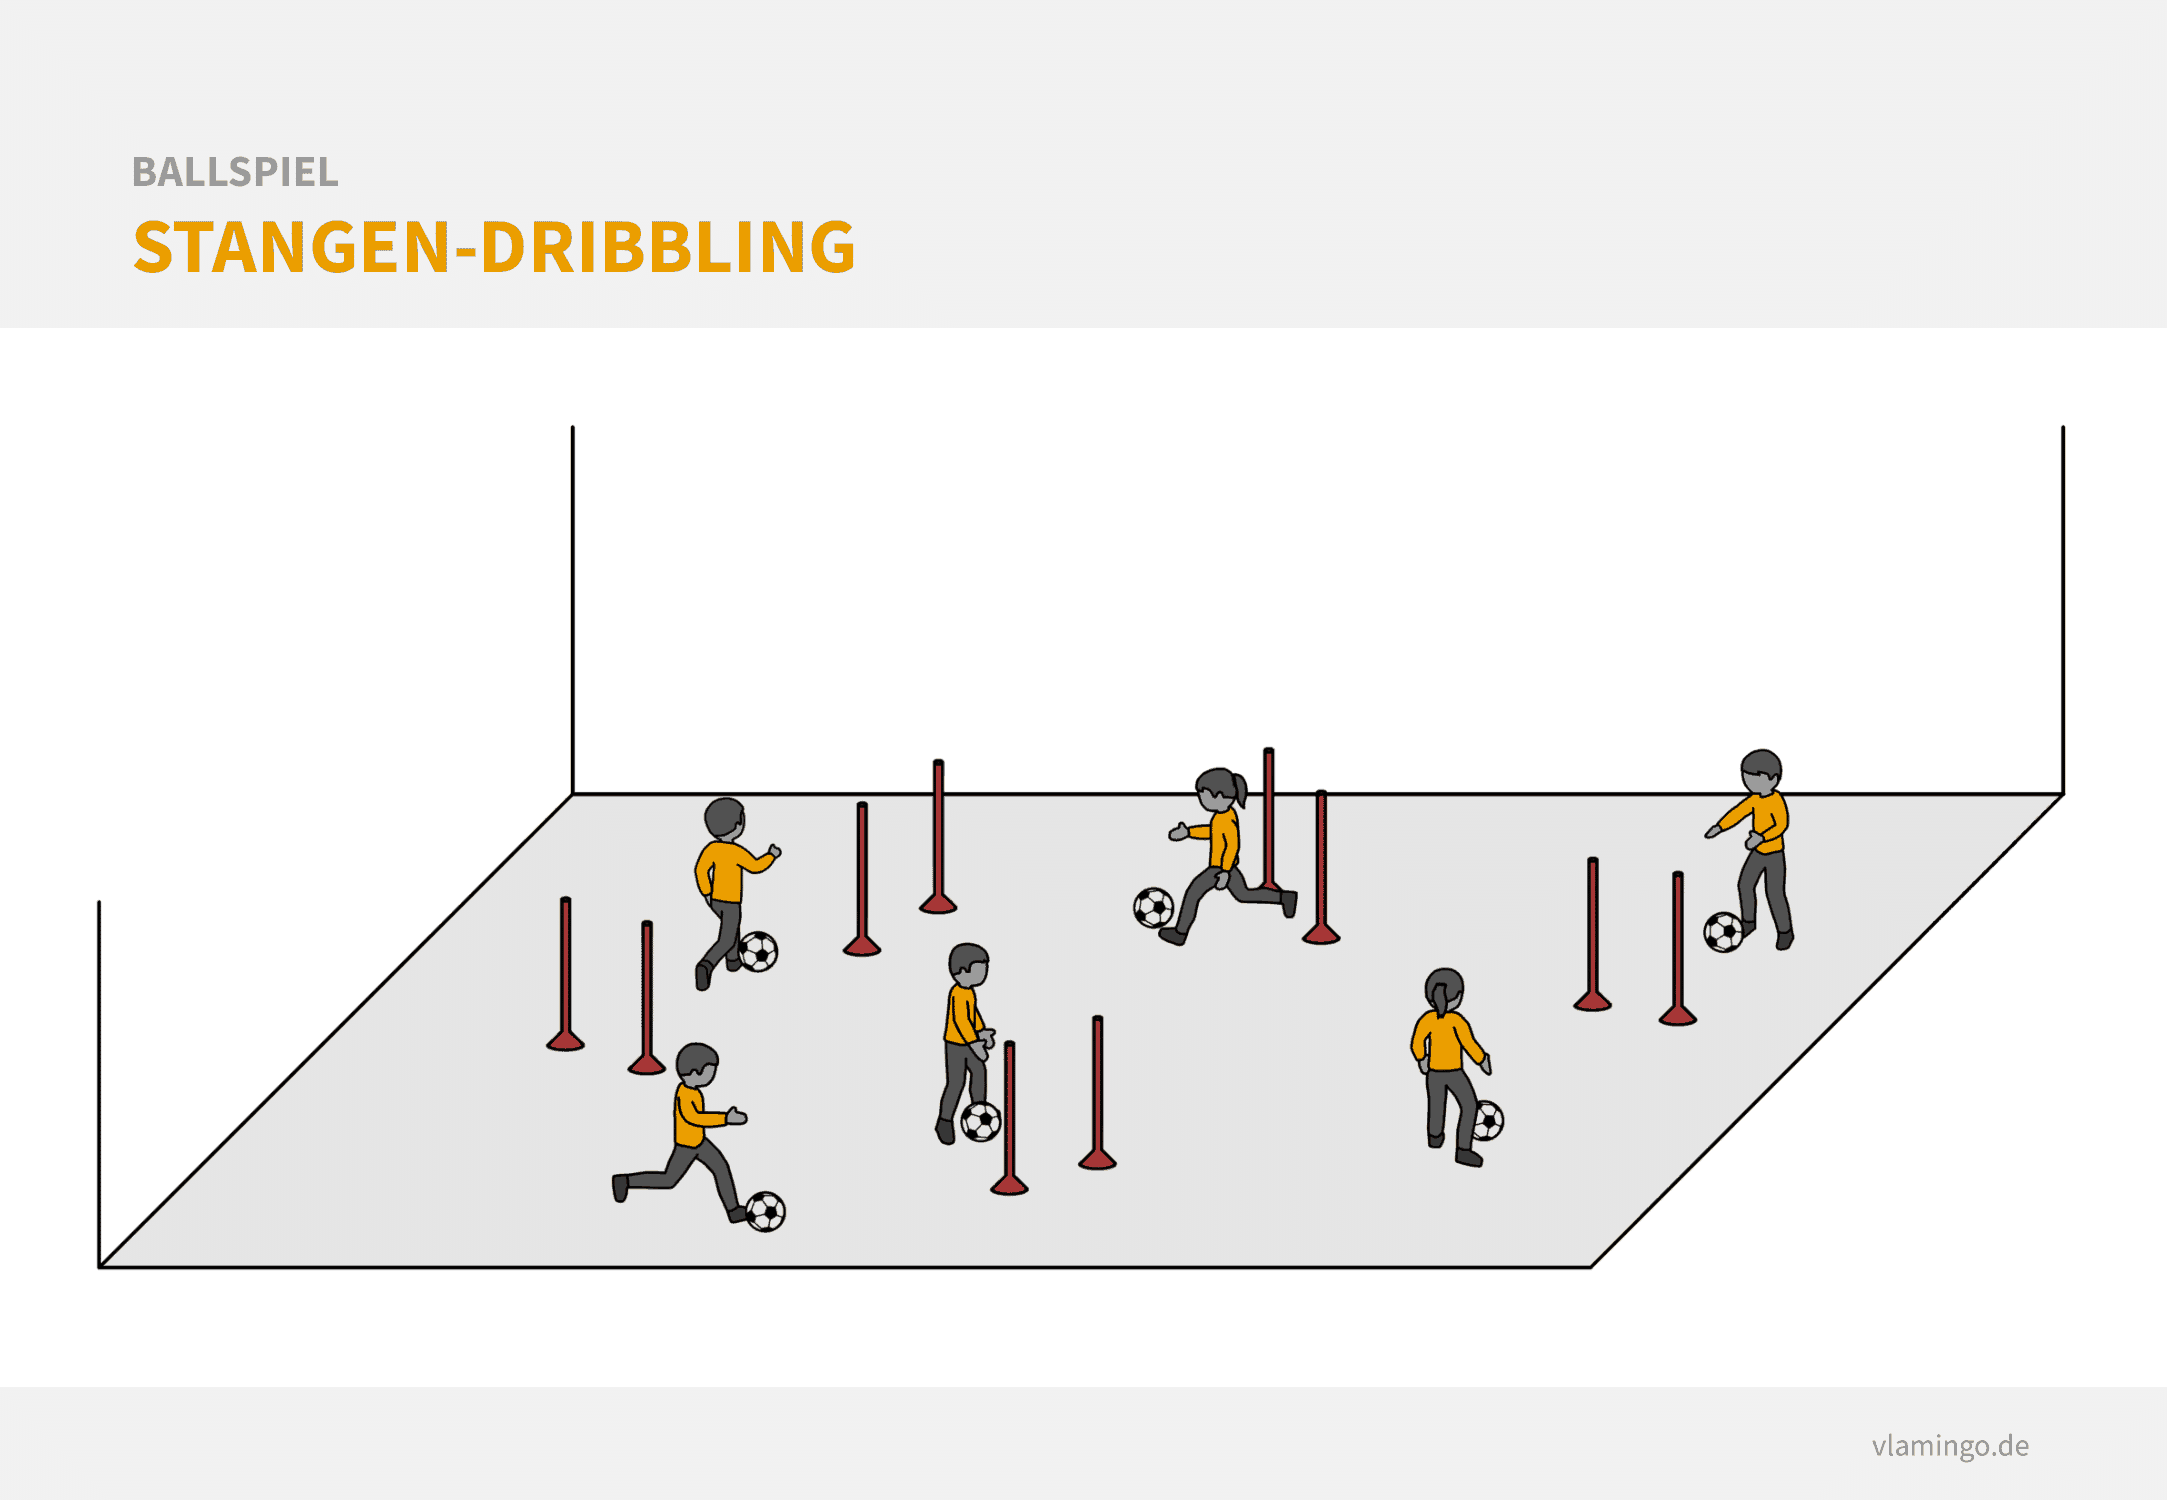 Fußball Aufwärmspiel: Stangen-Dribbling